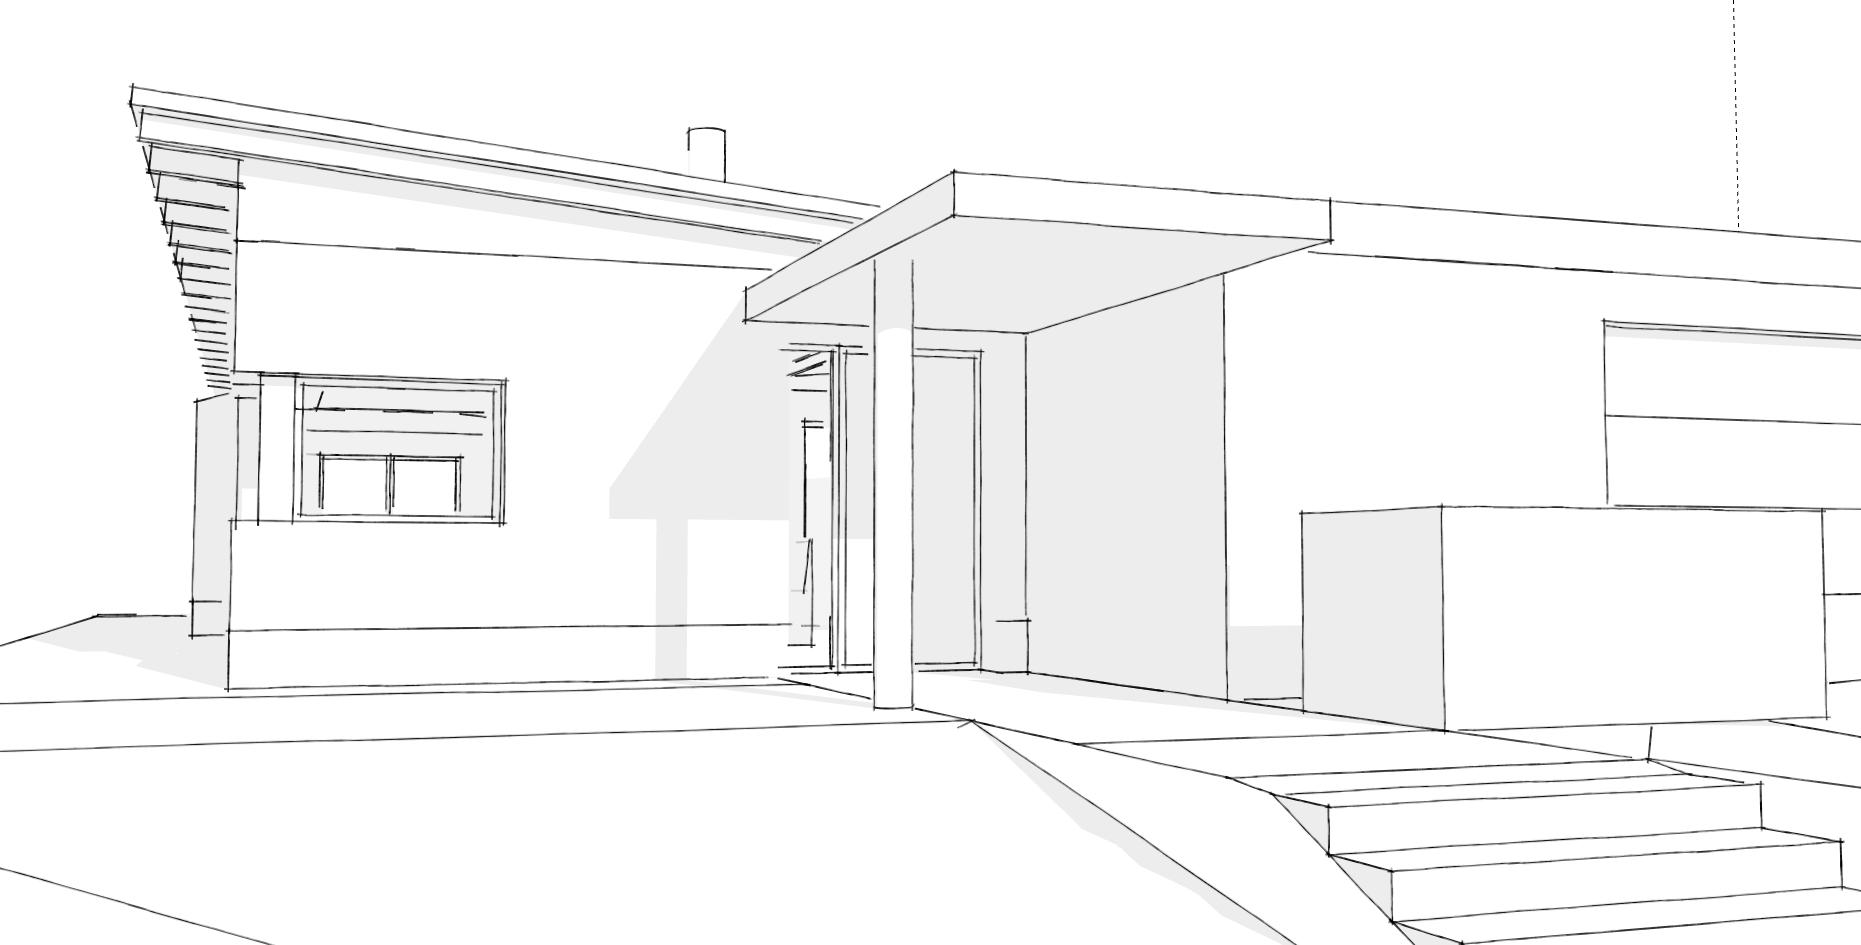 15_entwurf_architektur_rolandgasperl.at